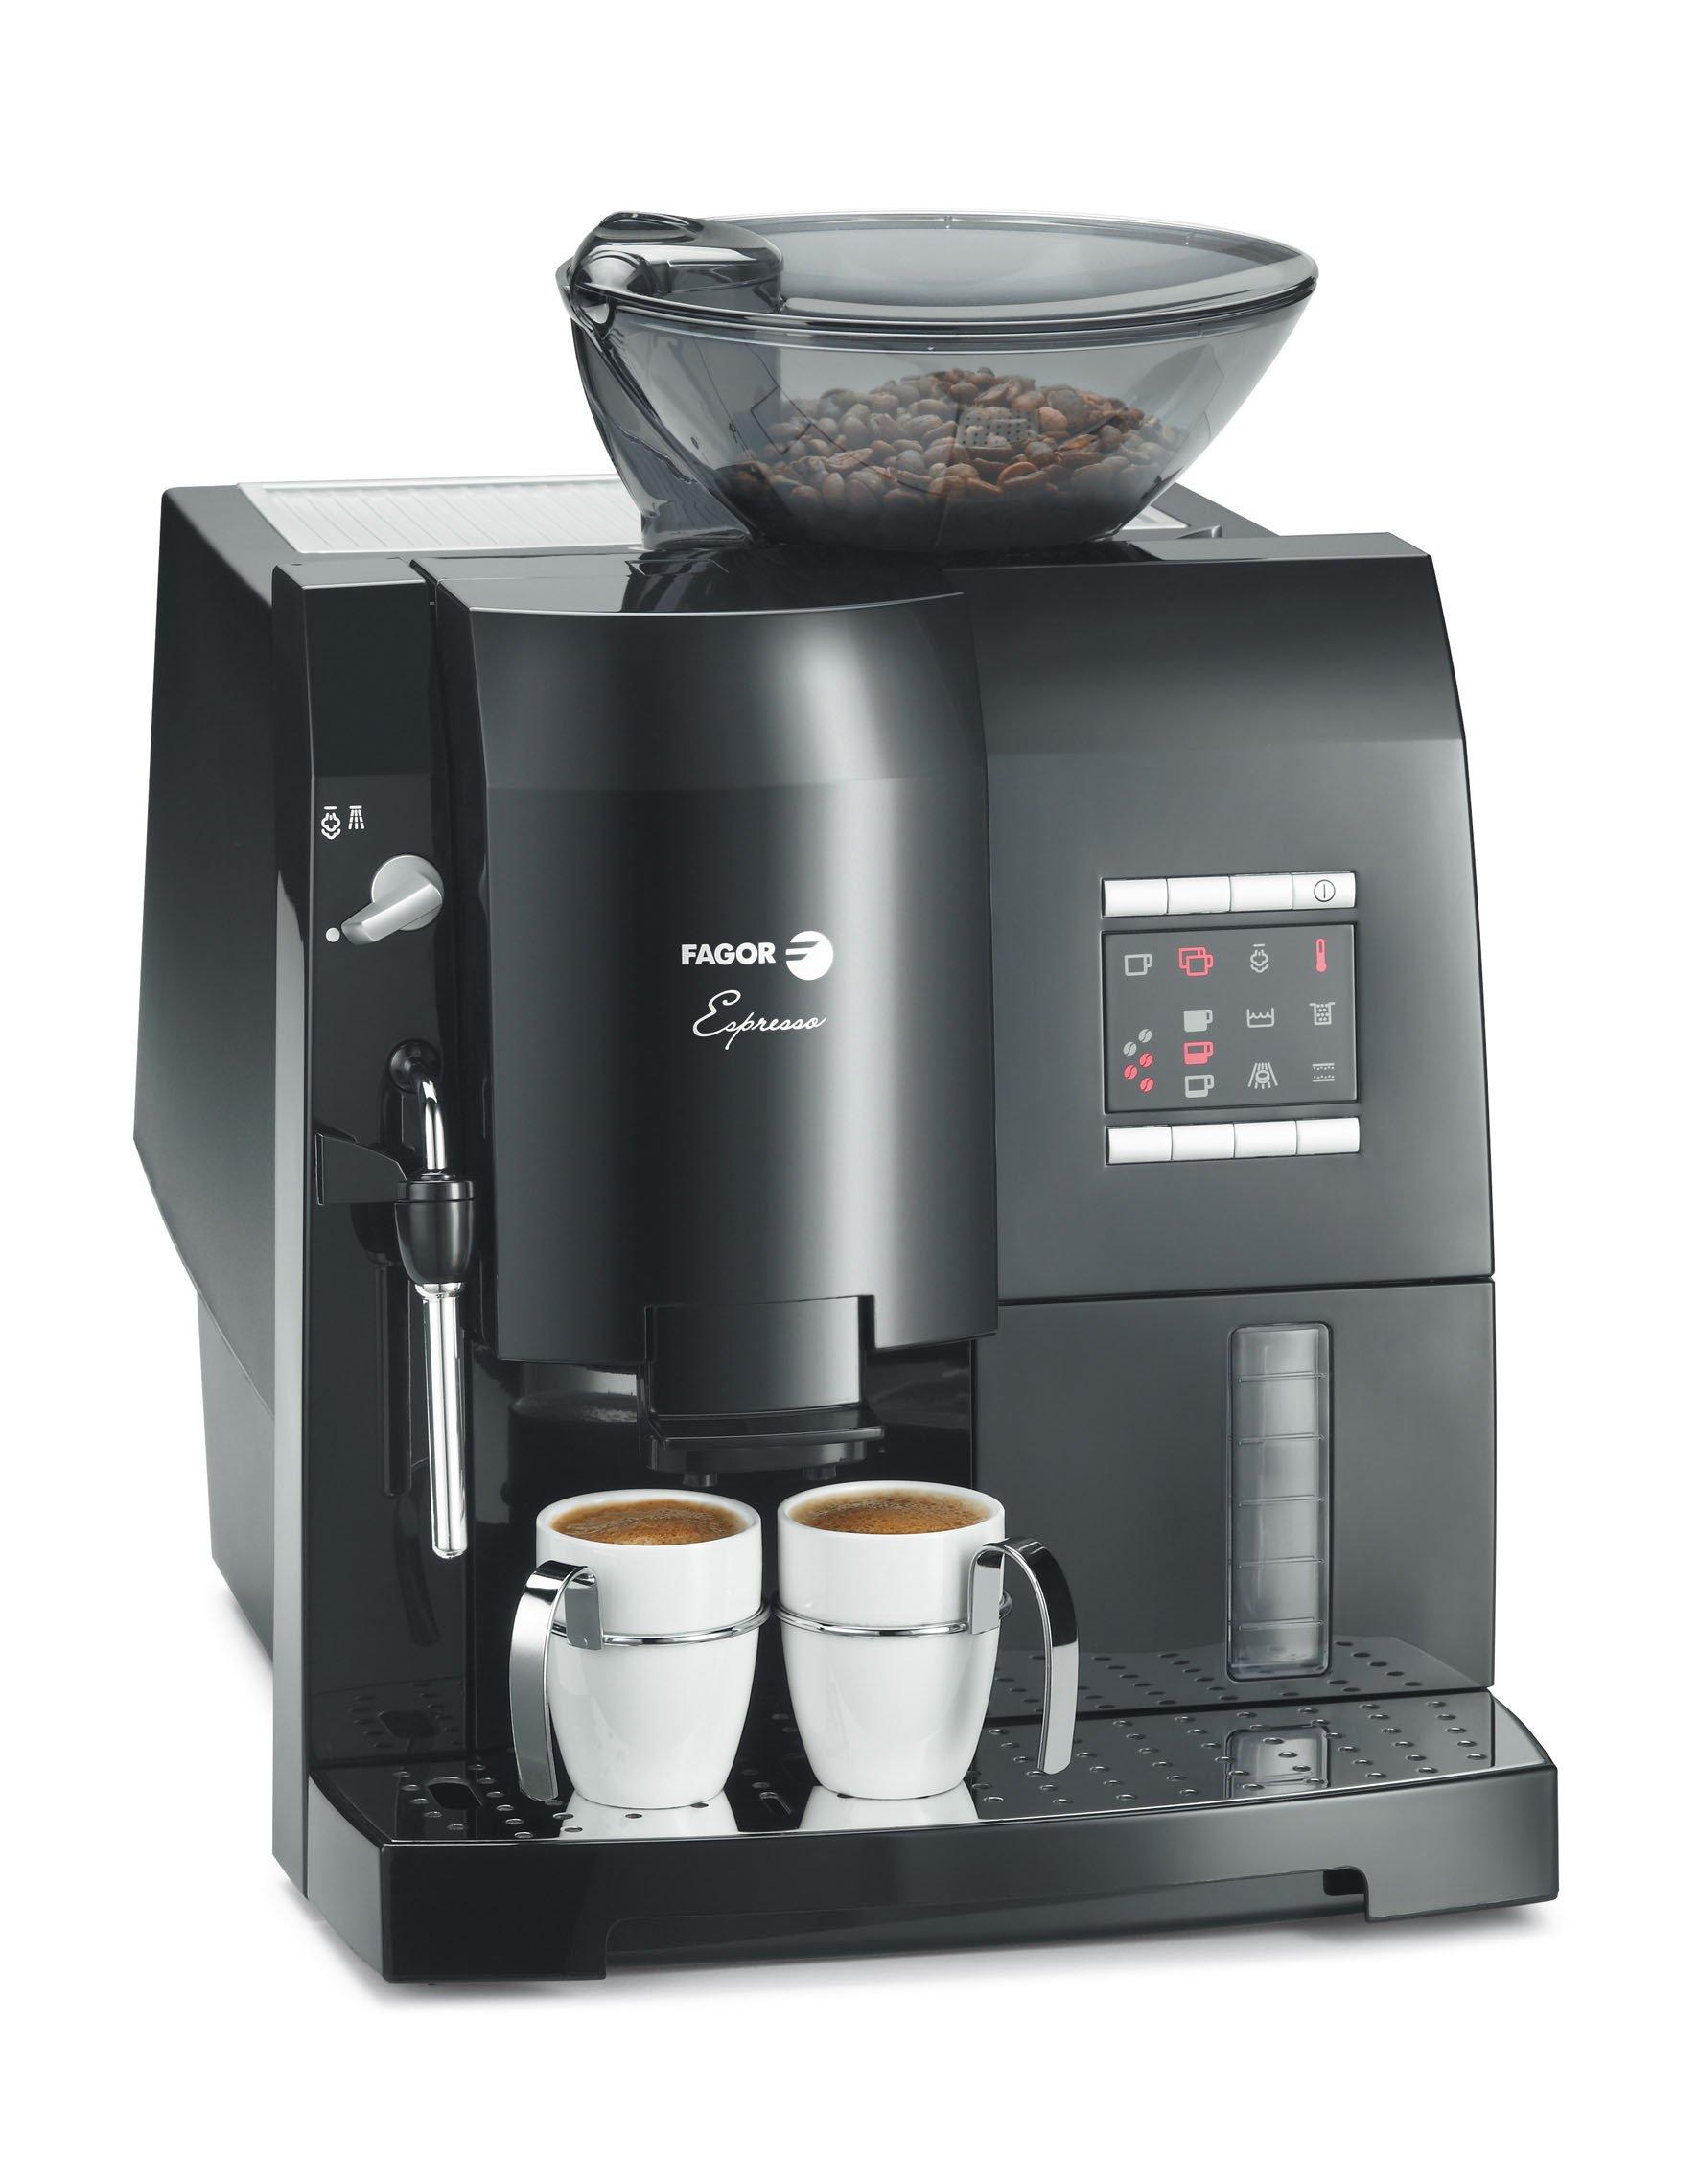 Fagor - Cafetera Espresso Cat40Ng, Display, 16 Bares, Thermoblok ...